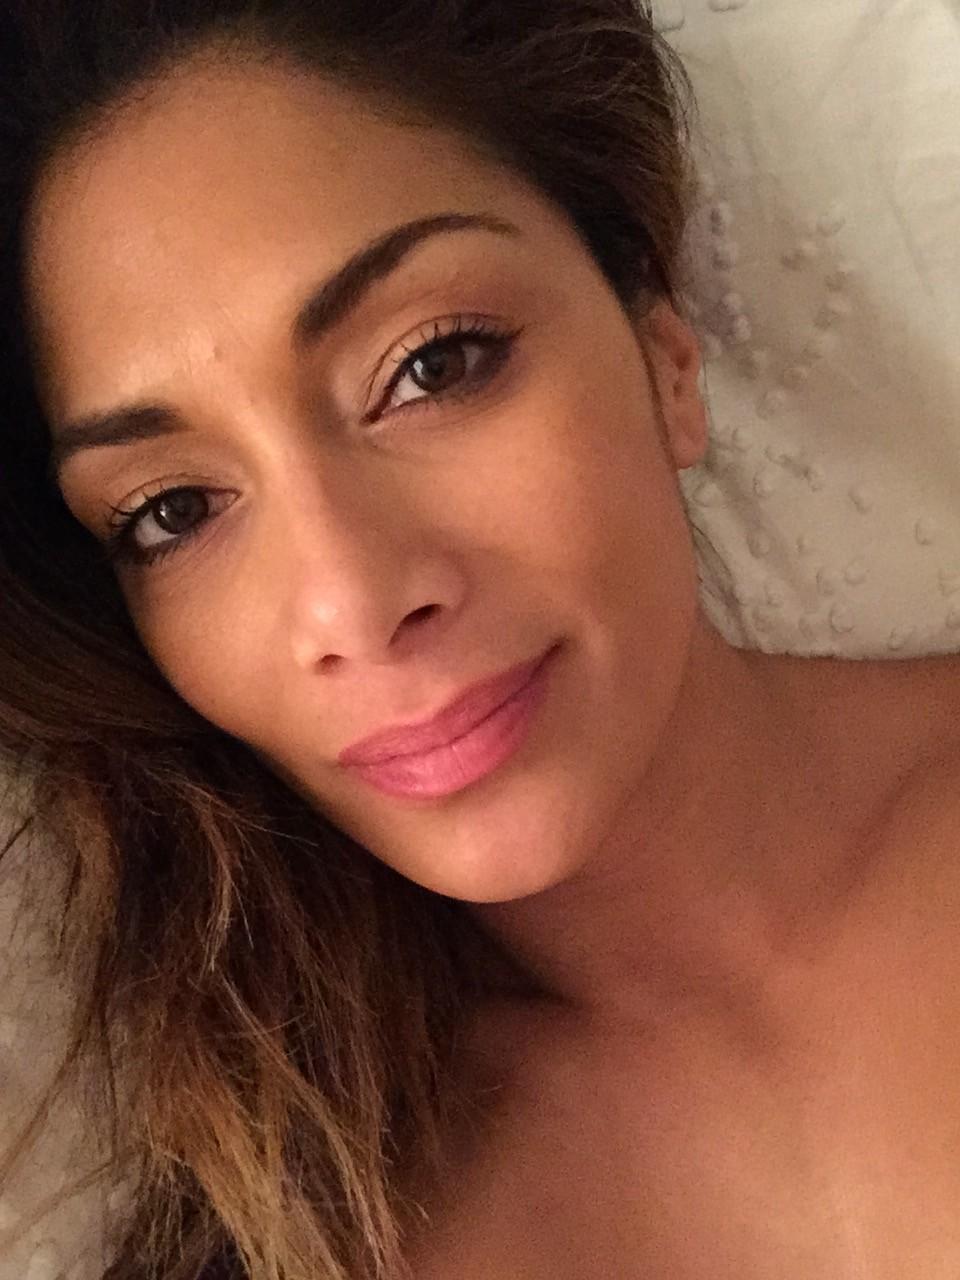 ... Nicole-Scherzinger-Leaked-Fappening-4-thefappening.us ...